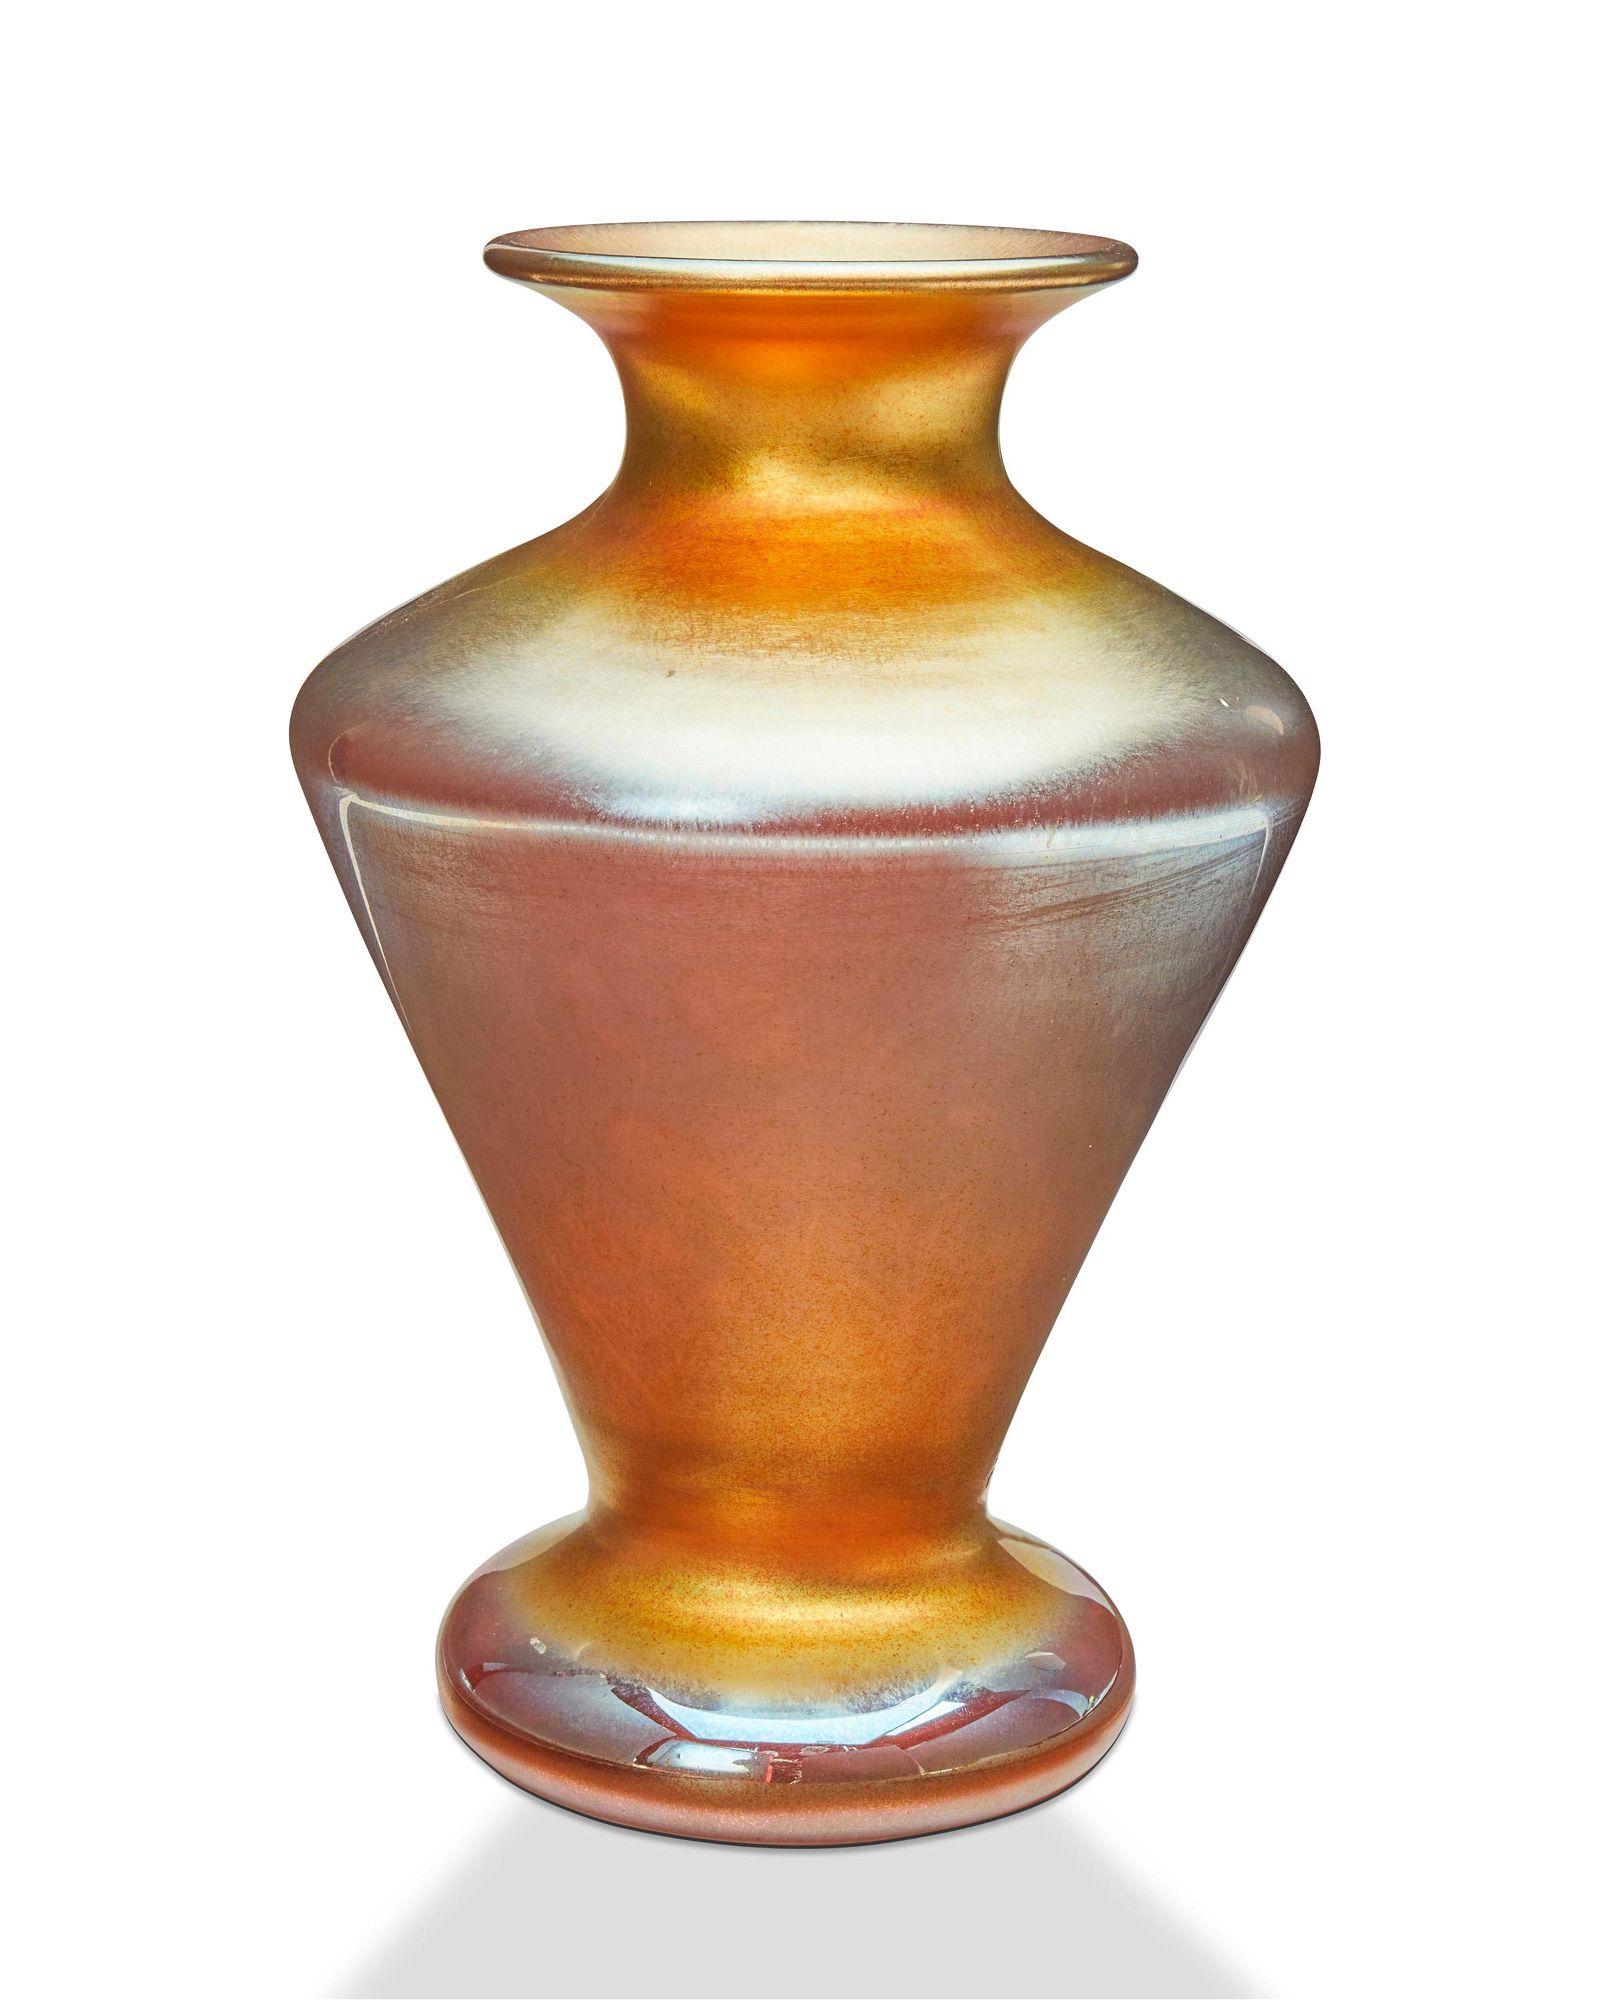 A Durand art glass vase